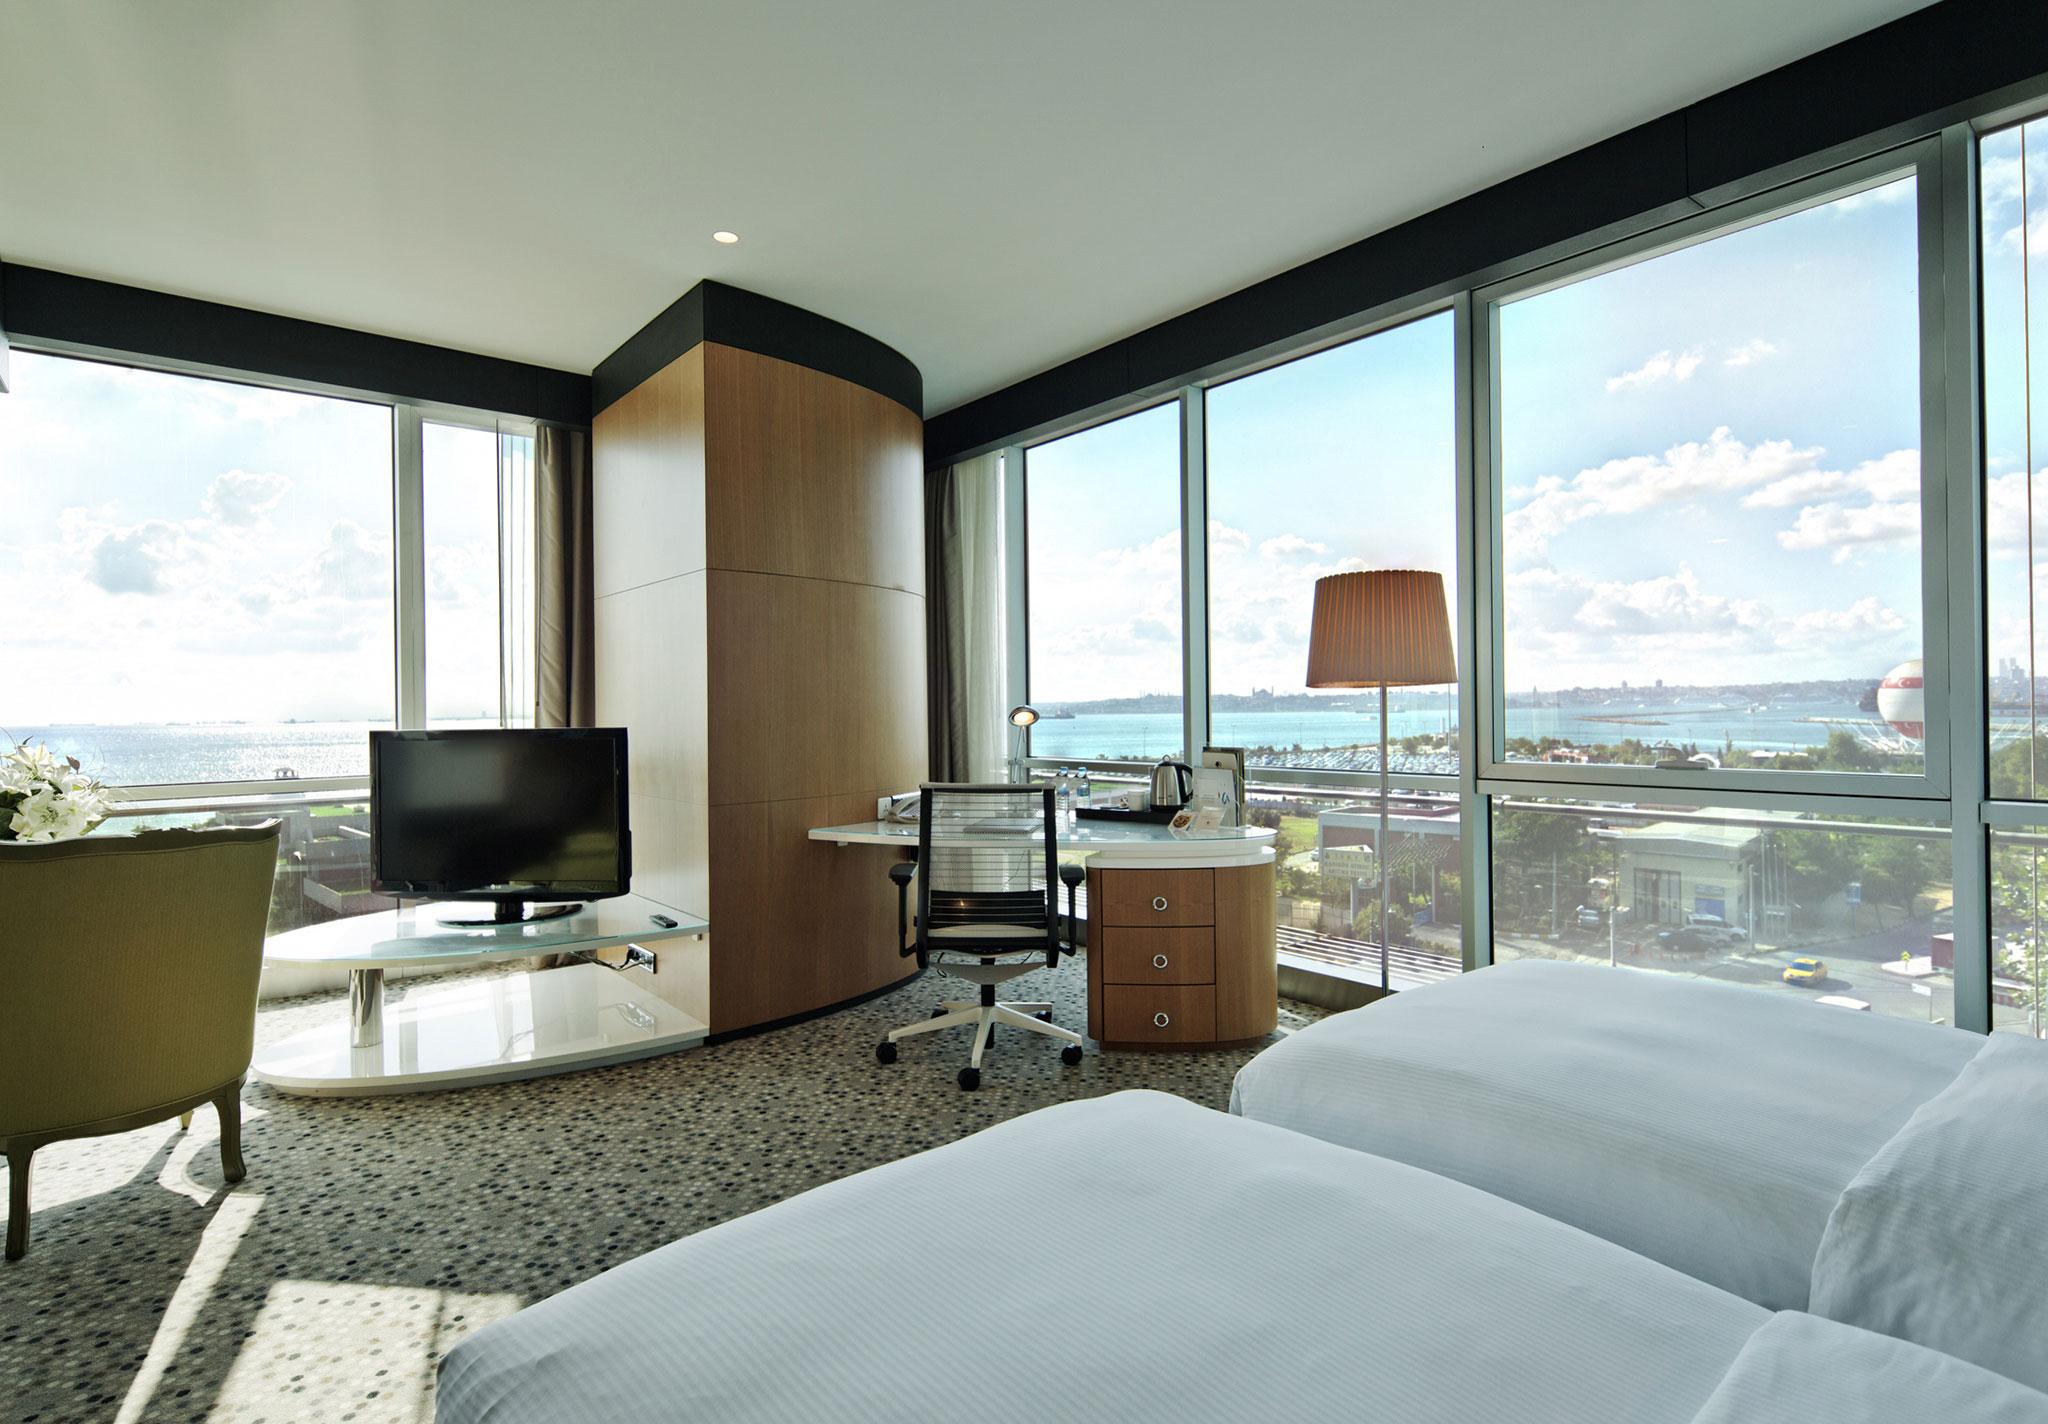 doubletree by hilton hotel istanbul moda ? kadikoy hotel - Modernes Schlafzimmer Interieur Reise